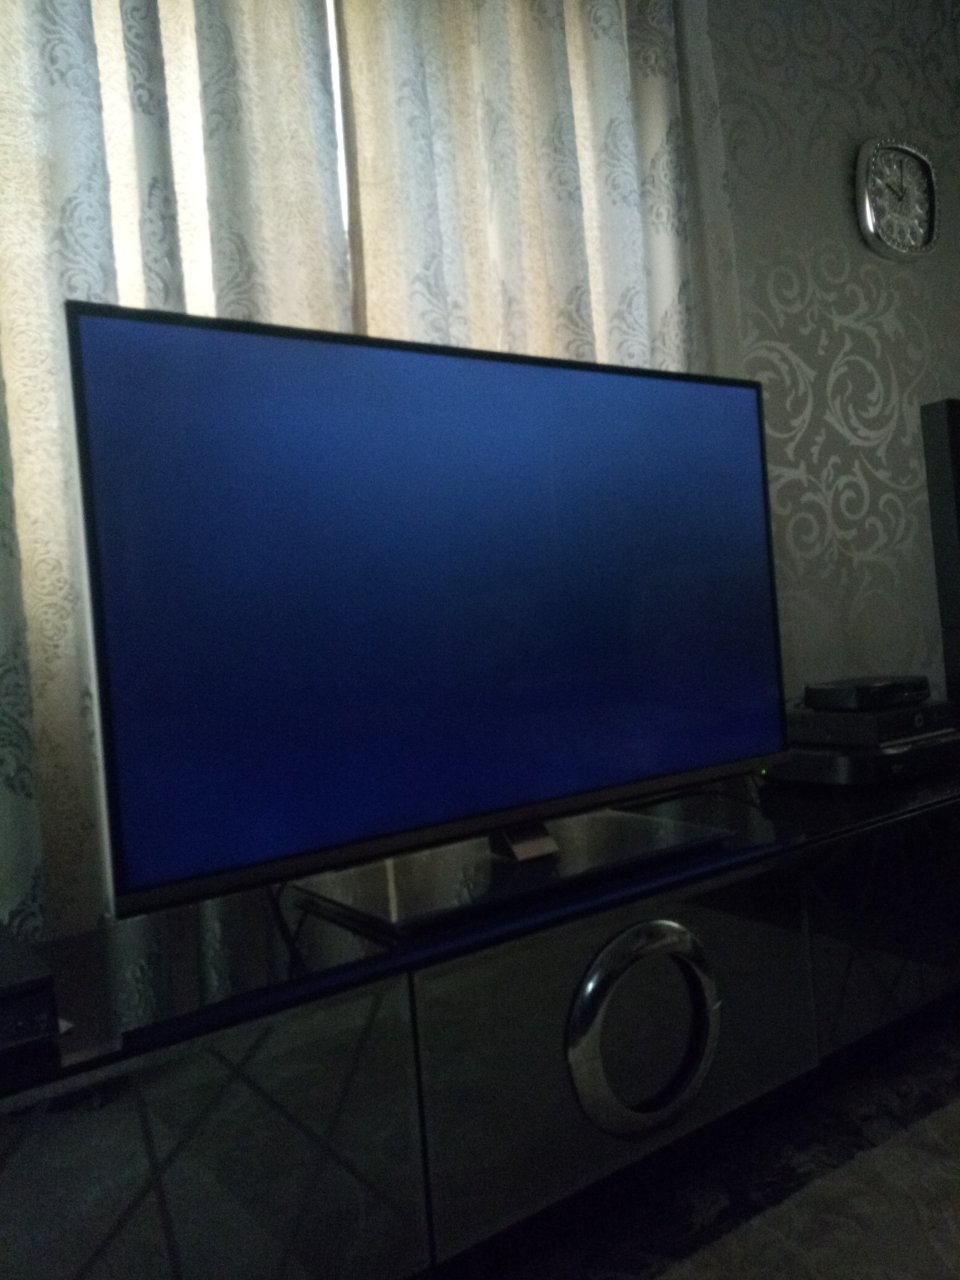 My JVC Smart Tv (LT-47n935 Series) Freeezes After Displaying